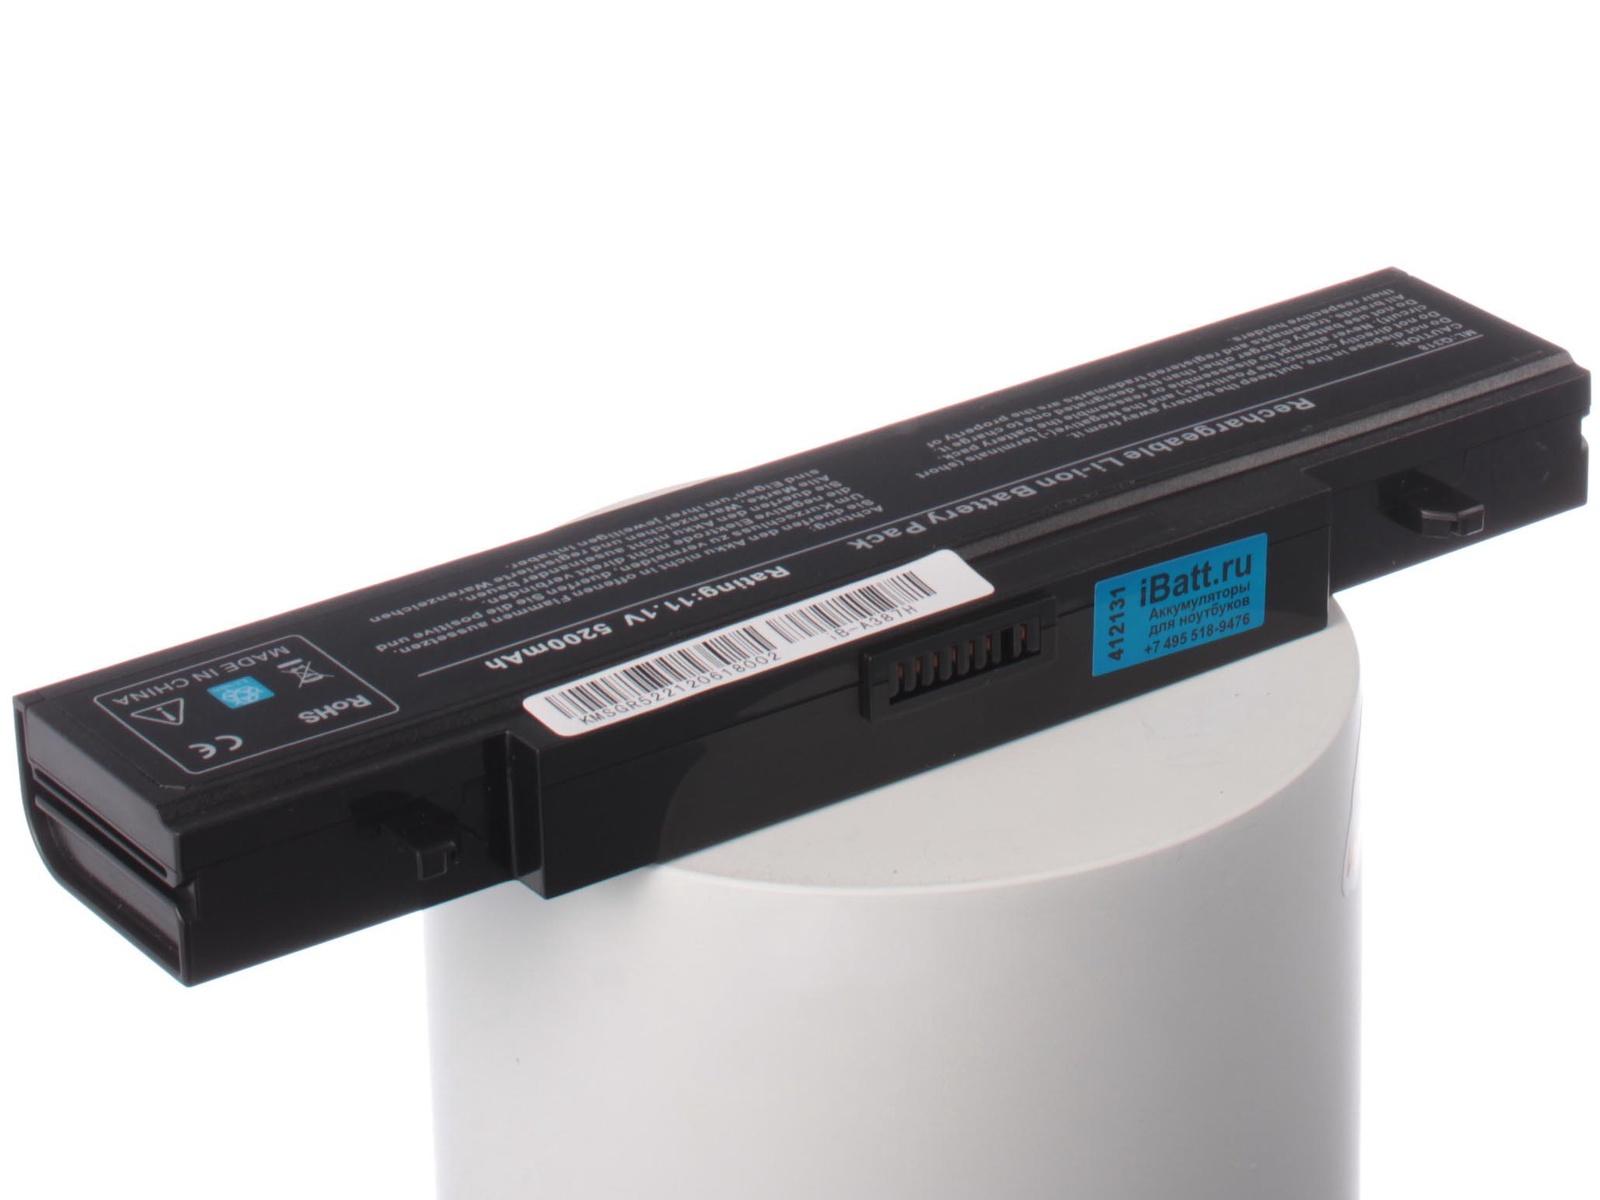 Аккумулятор для ноутбука iBatt для Samsung R528-DS04, R530-JA04, R530-JB02, R540-JA09, R540-JS03, R620-JS01, R730-JT04, RC510-S01, RF512, RF712-S02, 270E5E-X01, 300E5A-S03, 300E5A-S06, 300E5A-S0B, 300E5Z-S02, 300V5A-S0K